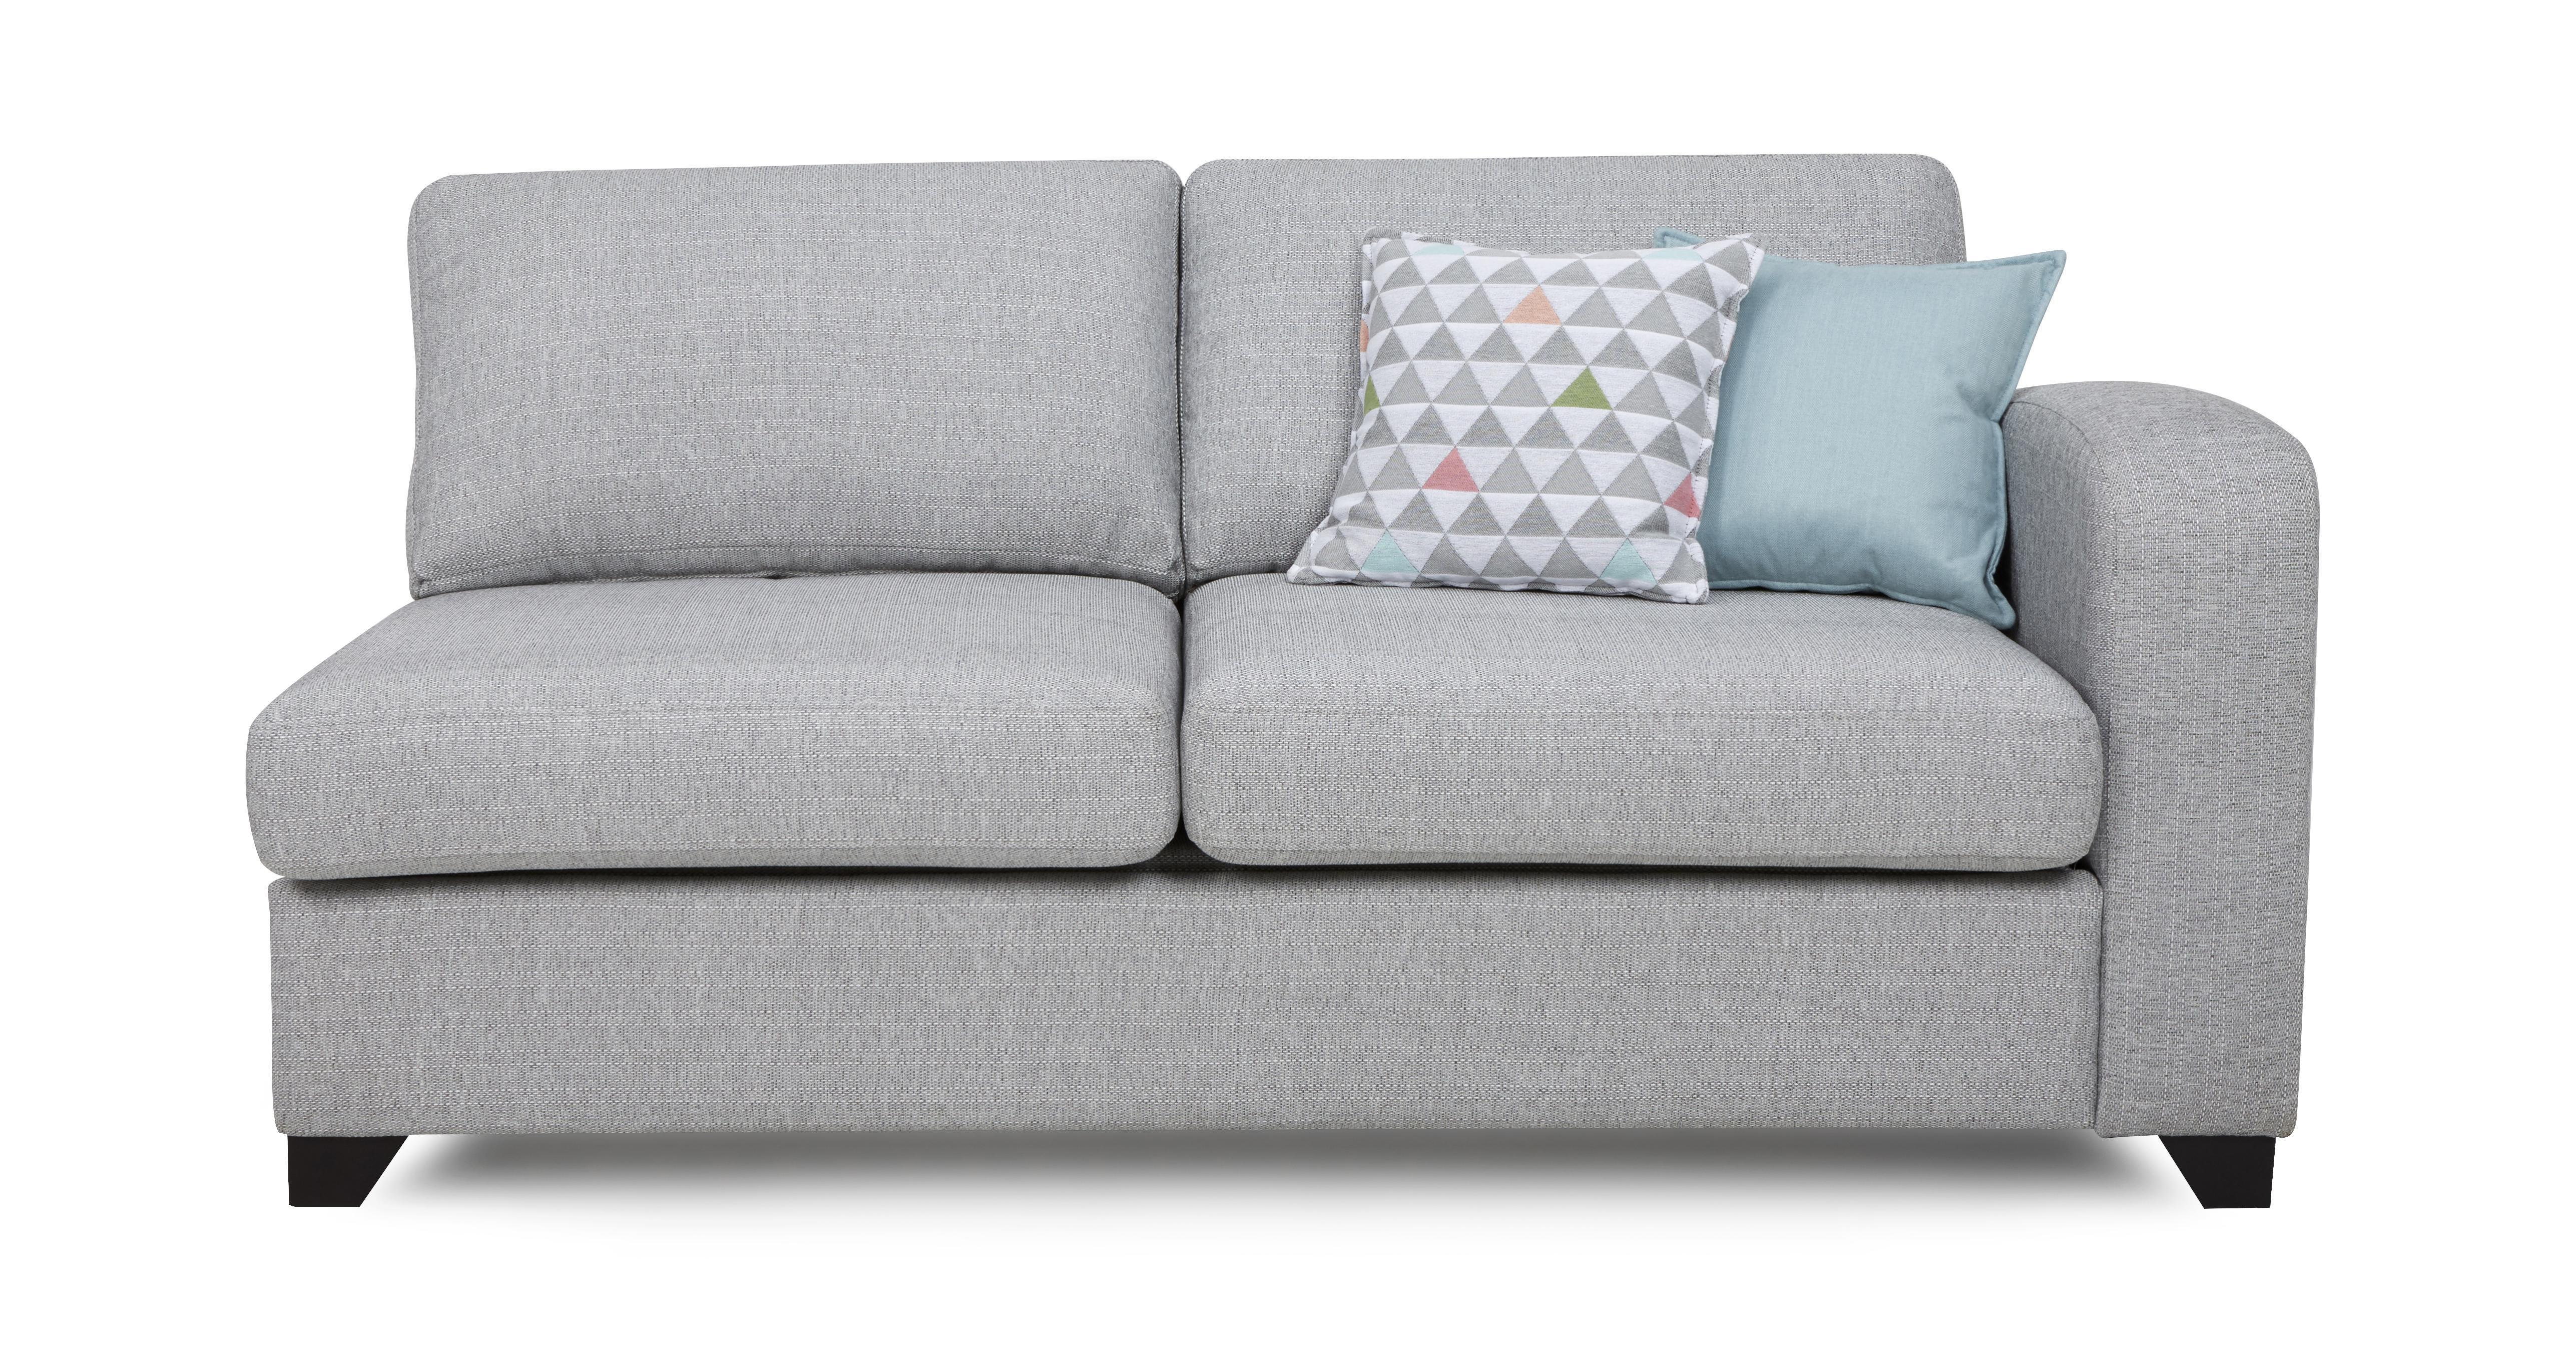 Prime Lydia Right Hand Facing 1 Arm 3 Seater Supreme Sofa Bed Machost Co Dining Chair Design Ideas Machostcouk